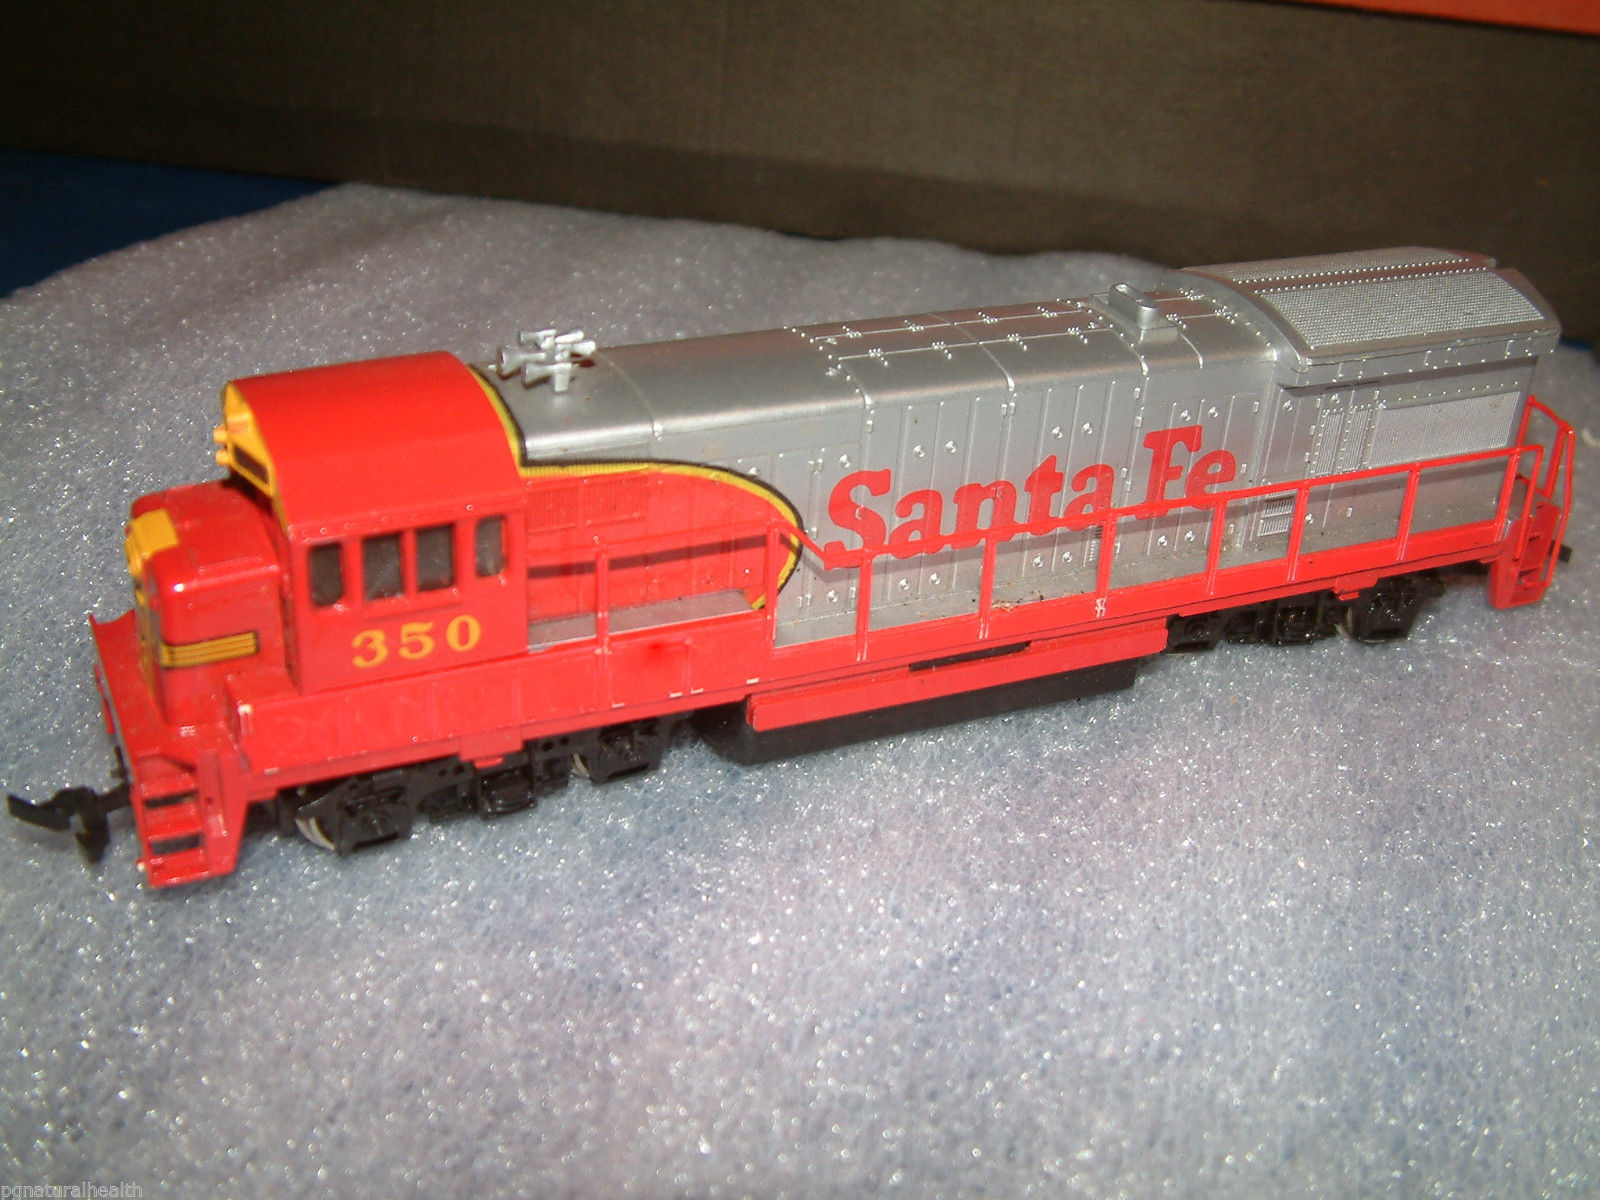 Fe train engine from 1984 bachmann power house yard boss ho train set